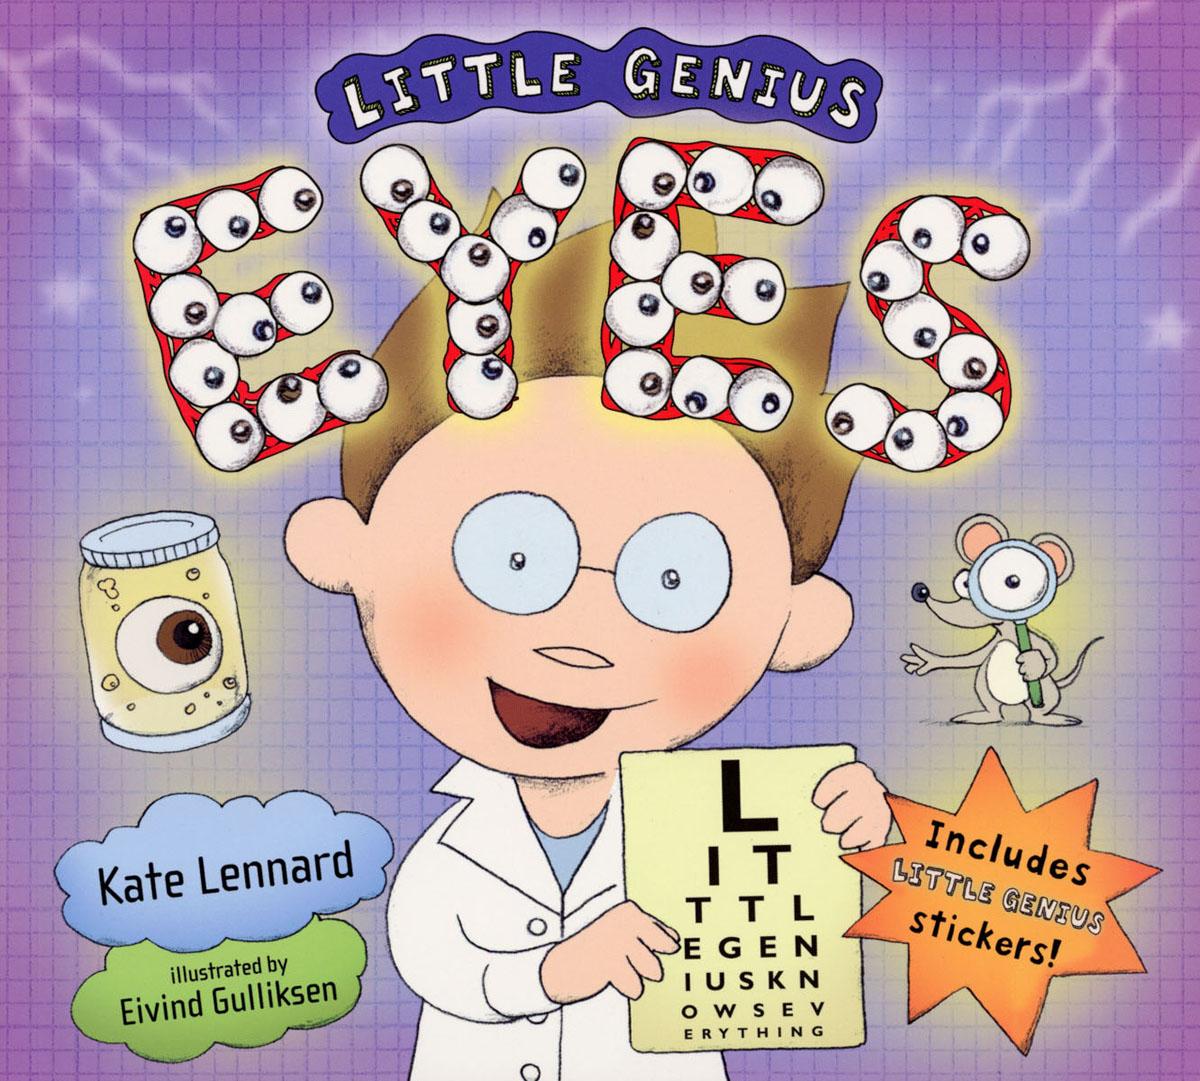 Little Genius: Eyes